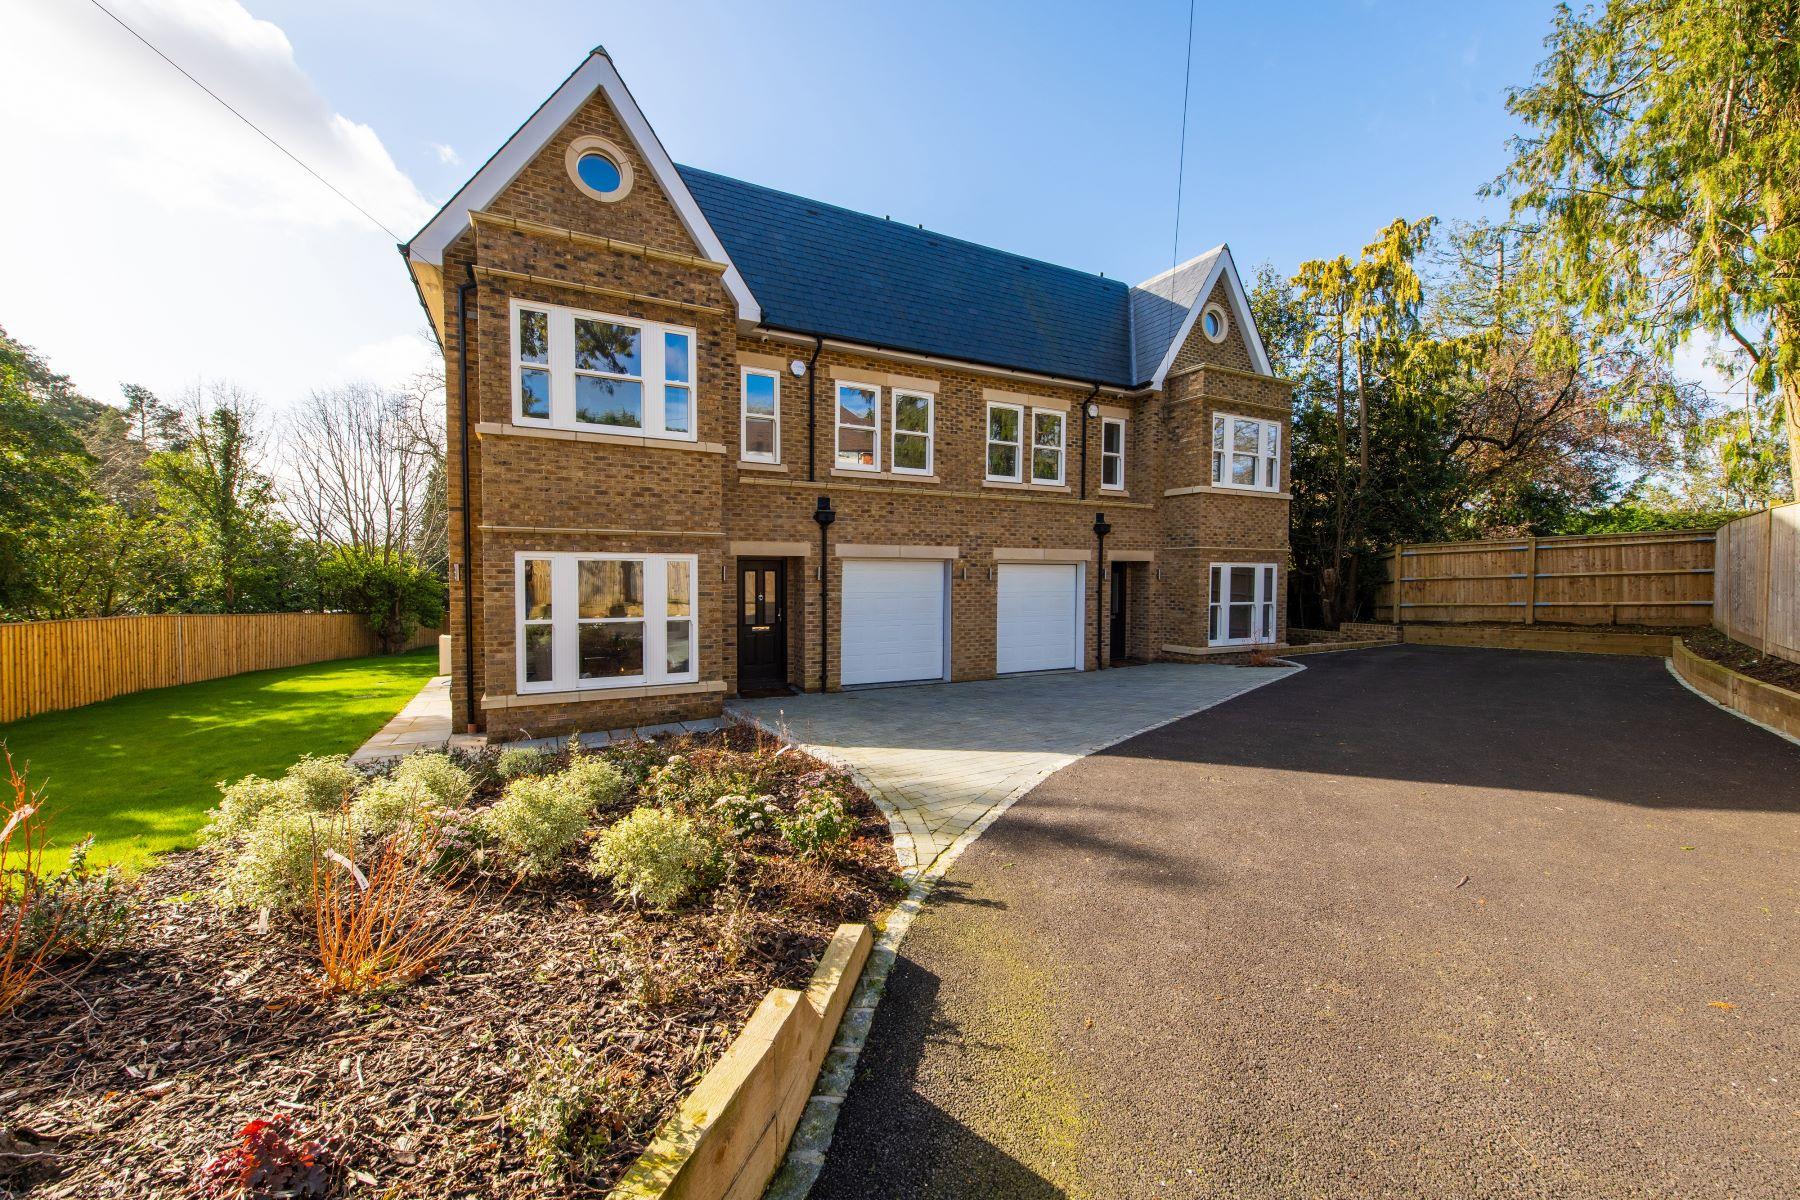 Single Family Homes for Sale at 2 Willowcroft, Leatherhead Road Oxshott, England KT22 0HG United Kingdom